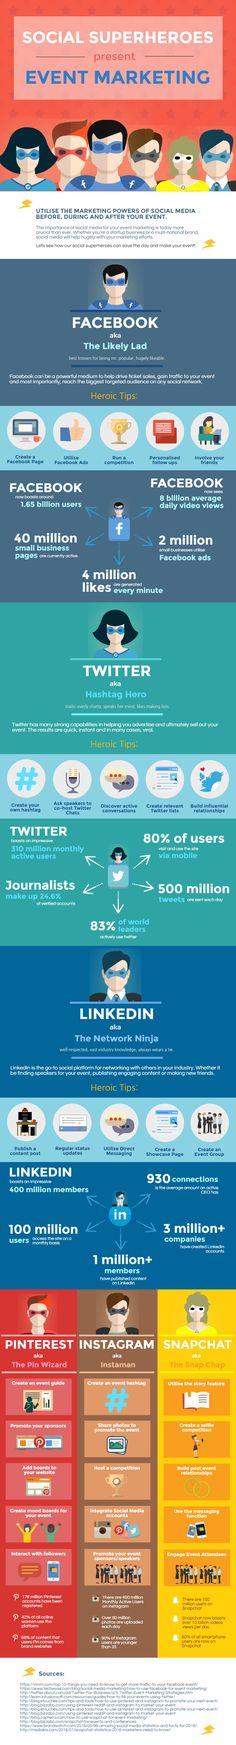 Event Marketing for Social Superheroes - Infographics - Website Magazine